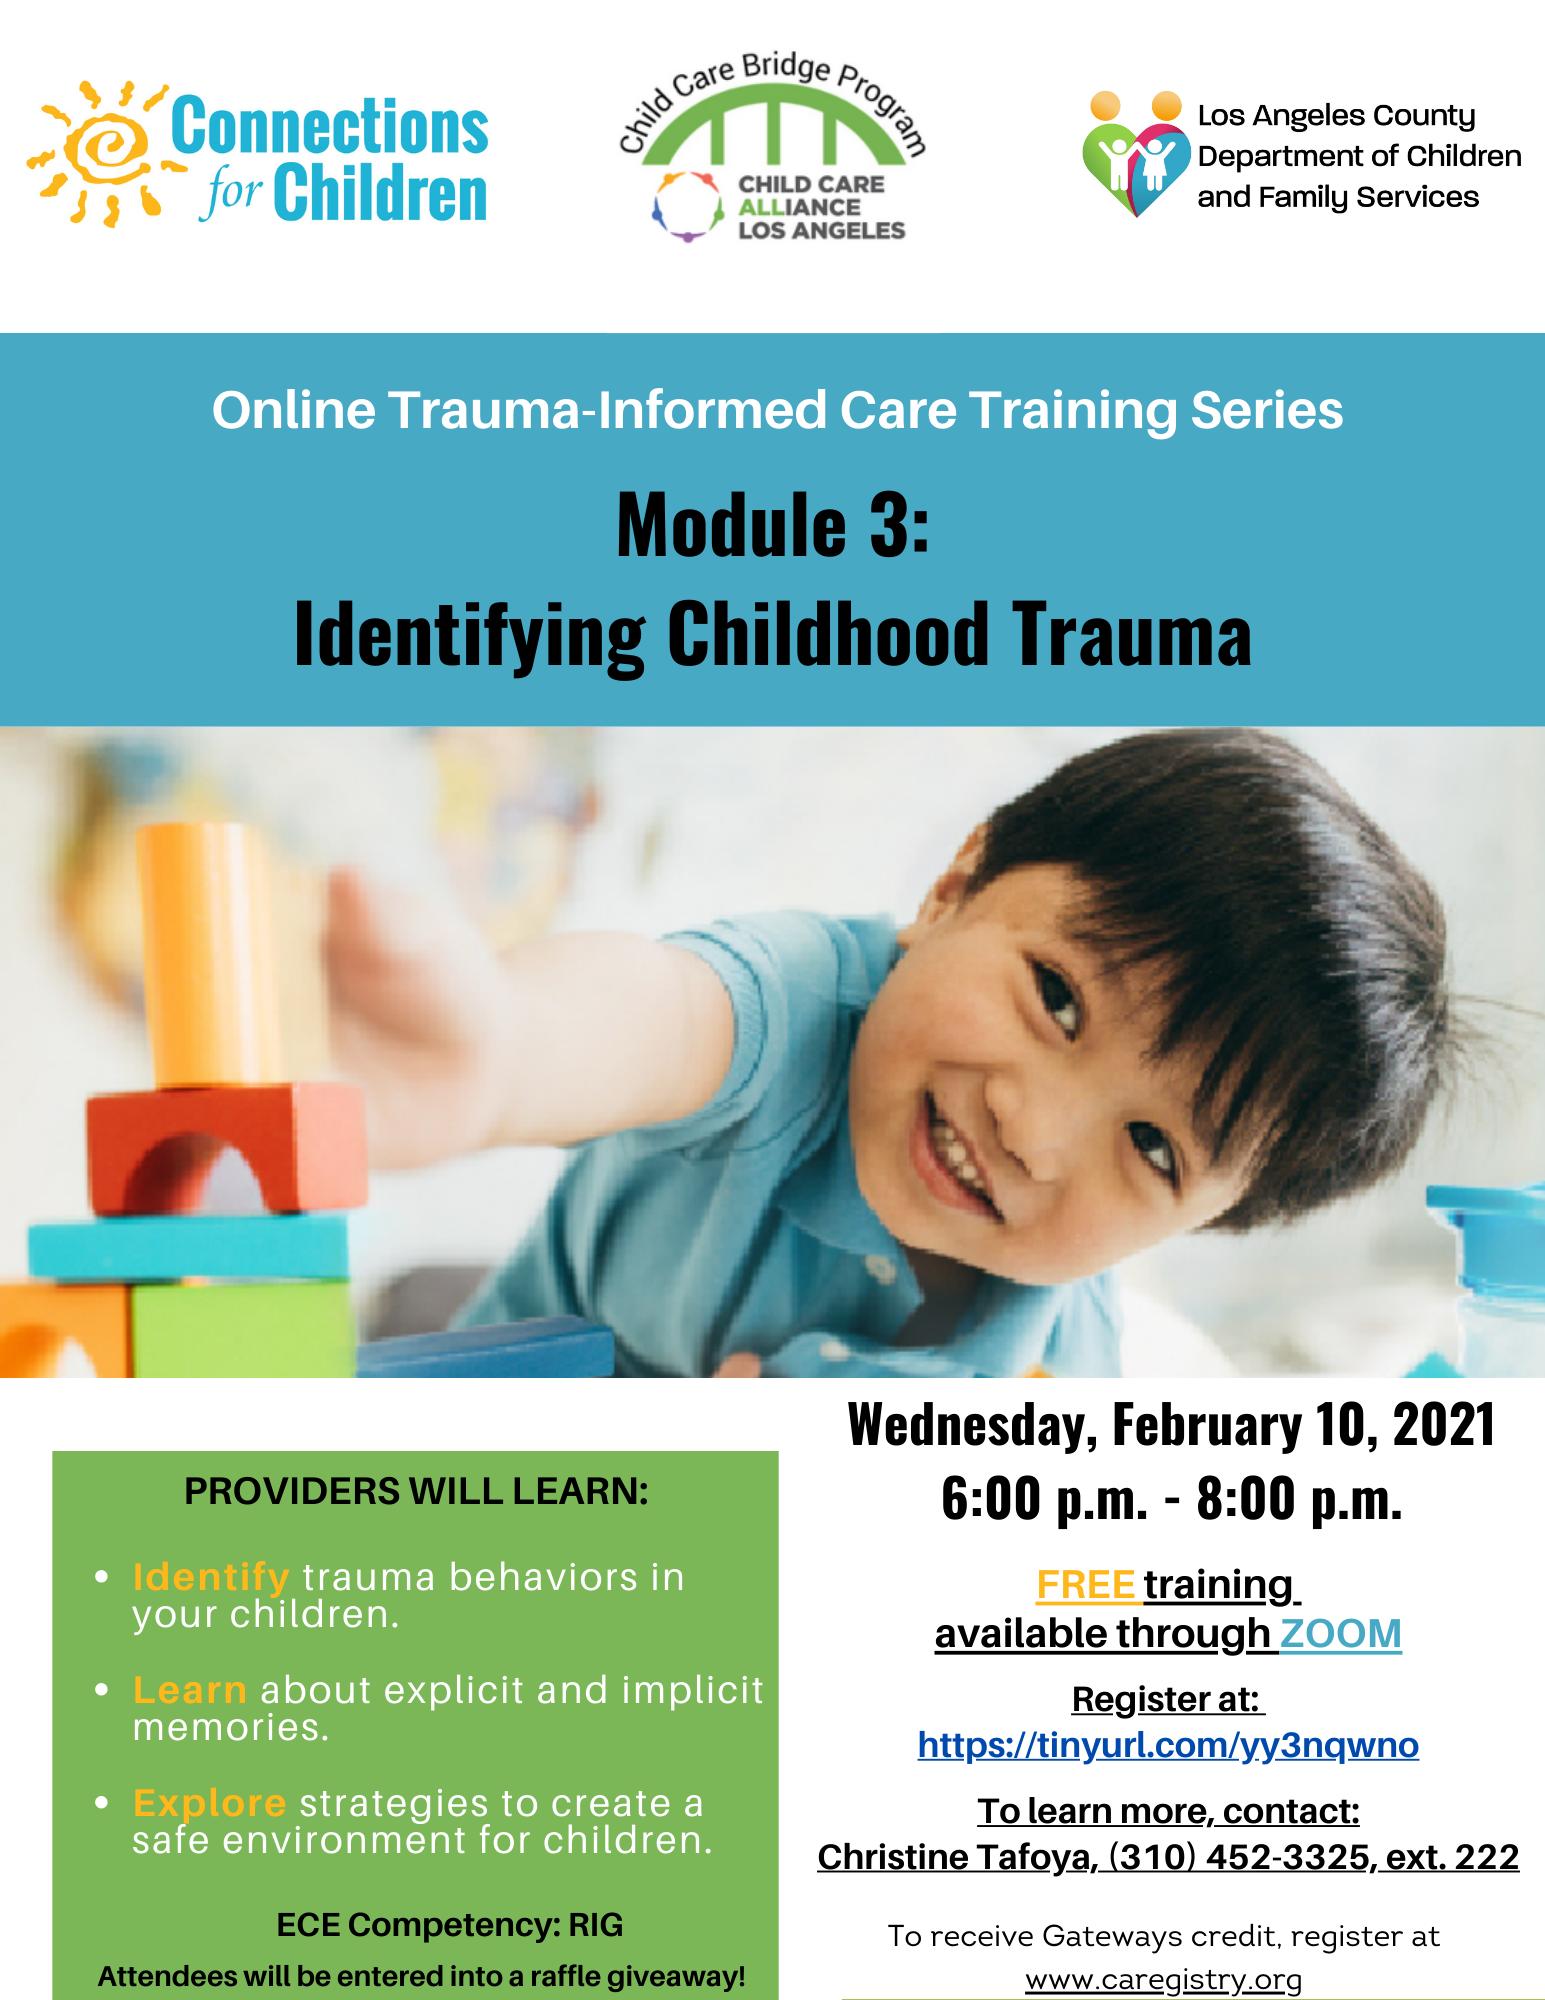 Identifying Childhood Trauma